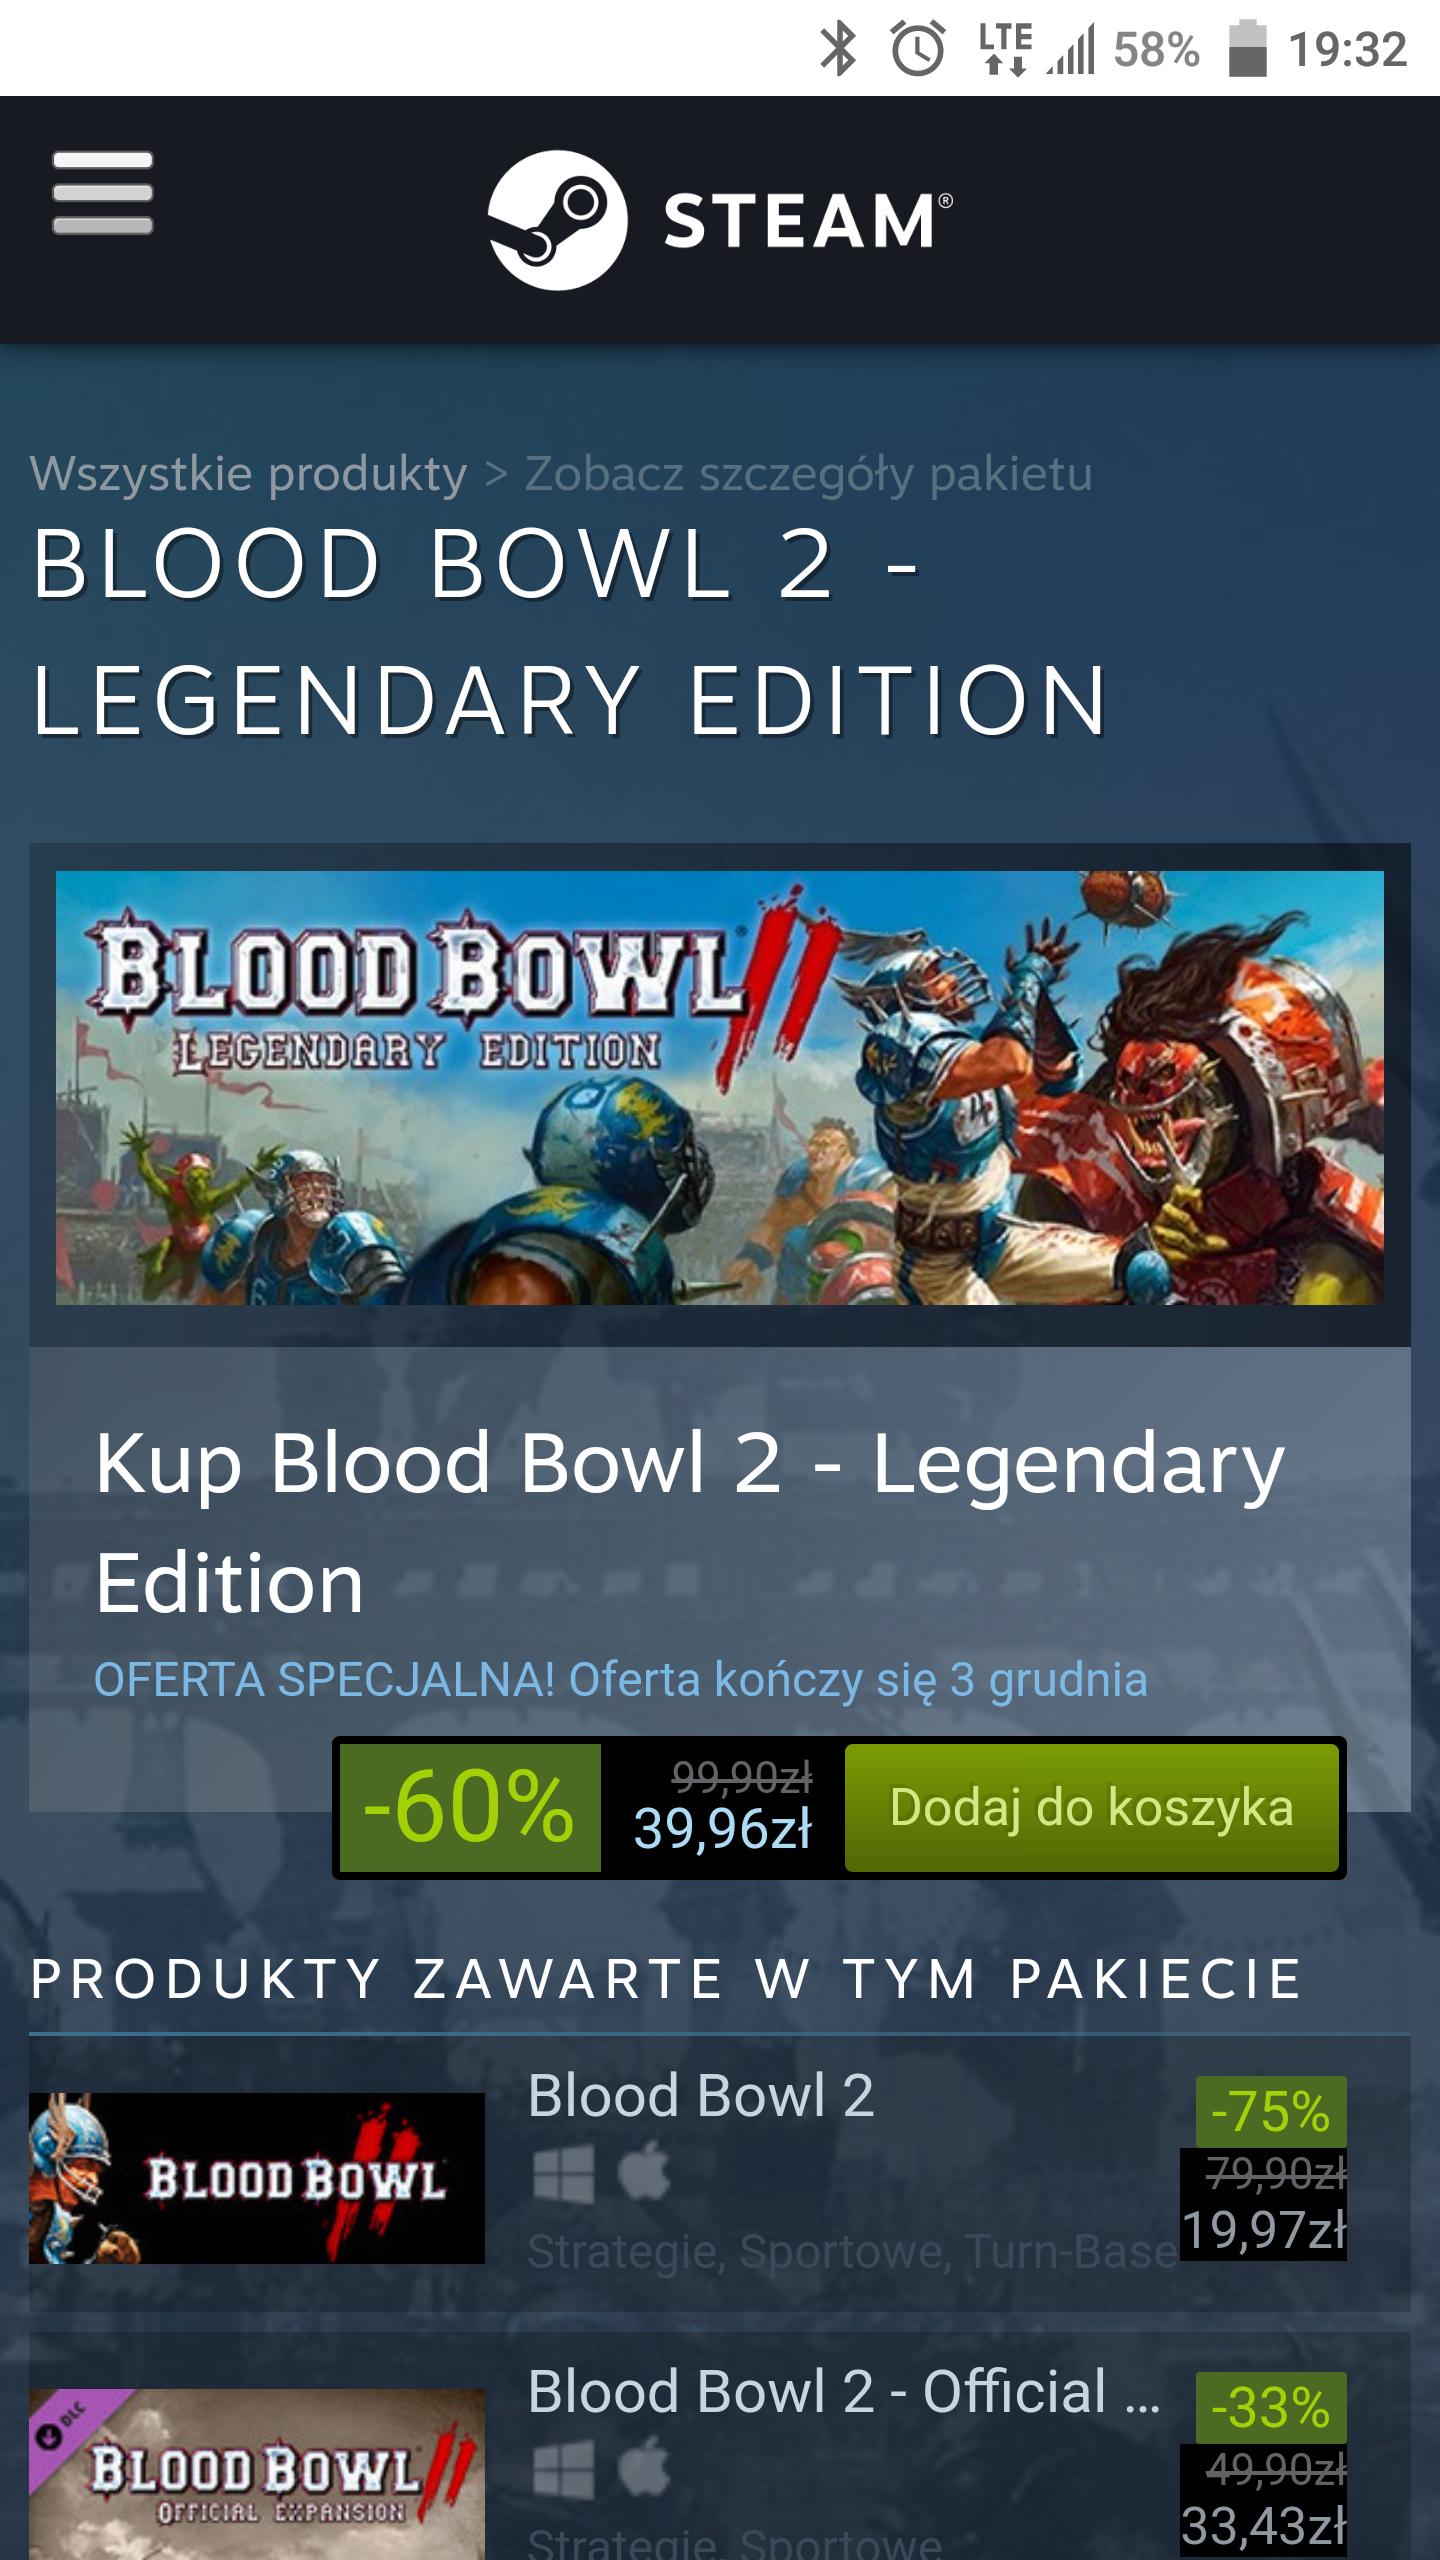 Promocja Blood Bowl 2 - Legendary Edition 60% taniej na steam.